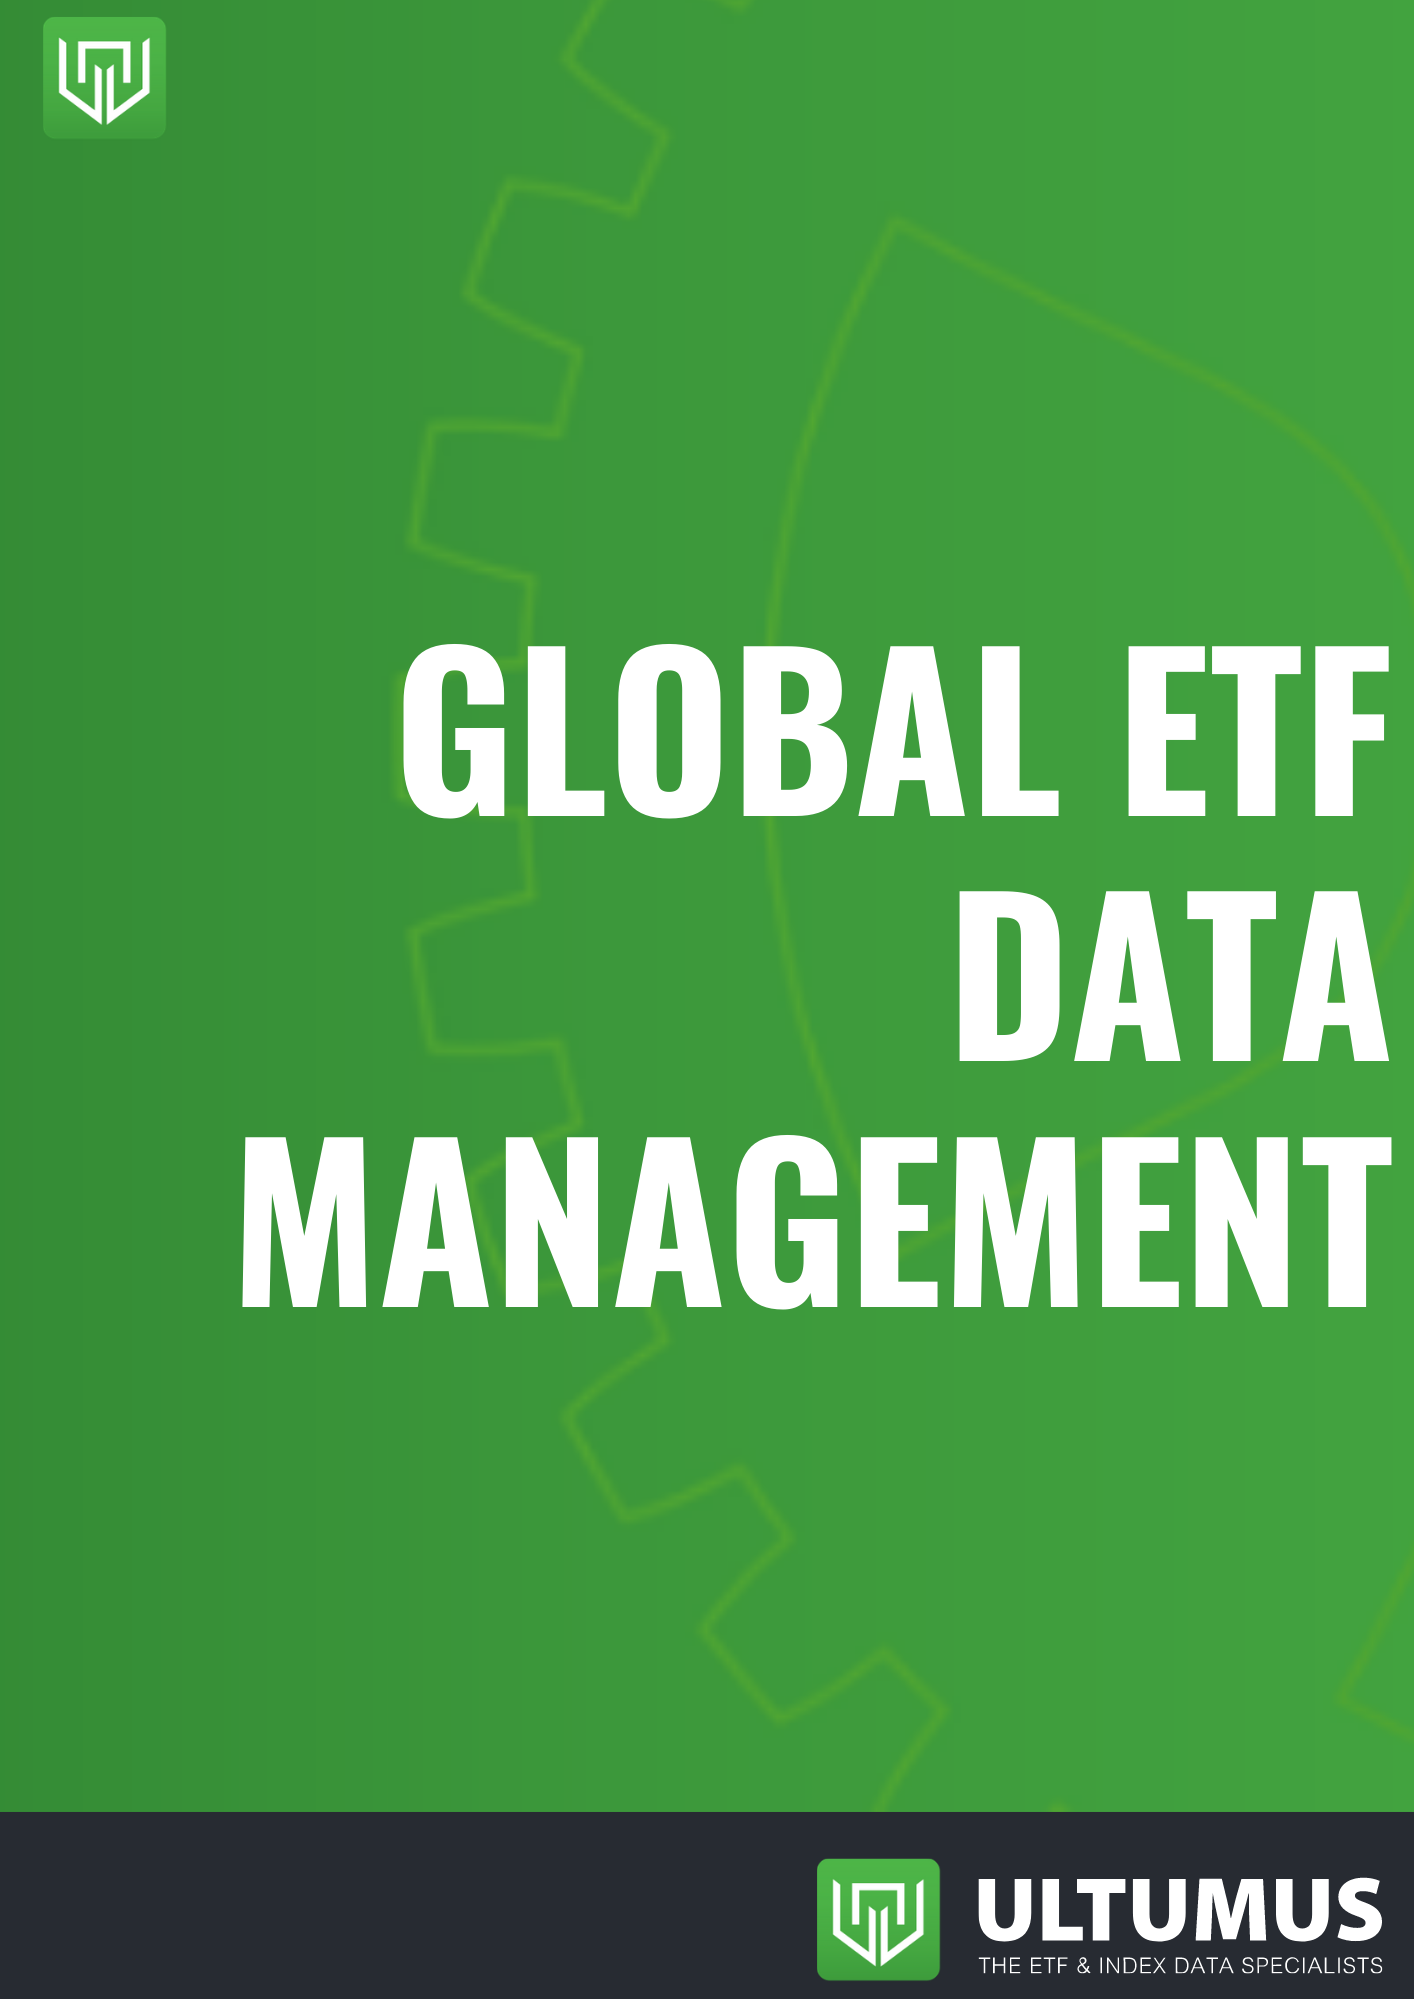 Global etf data management